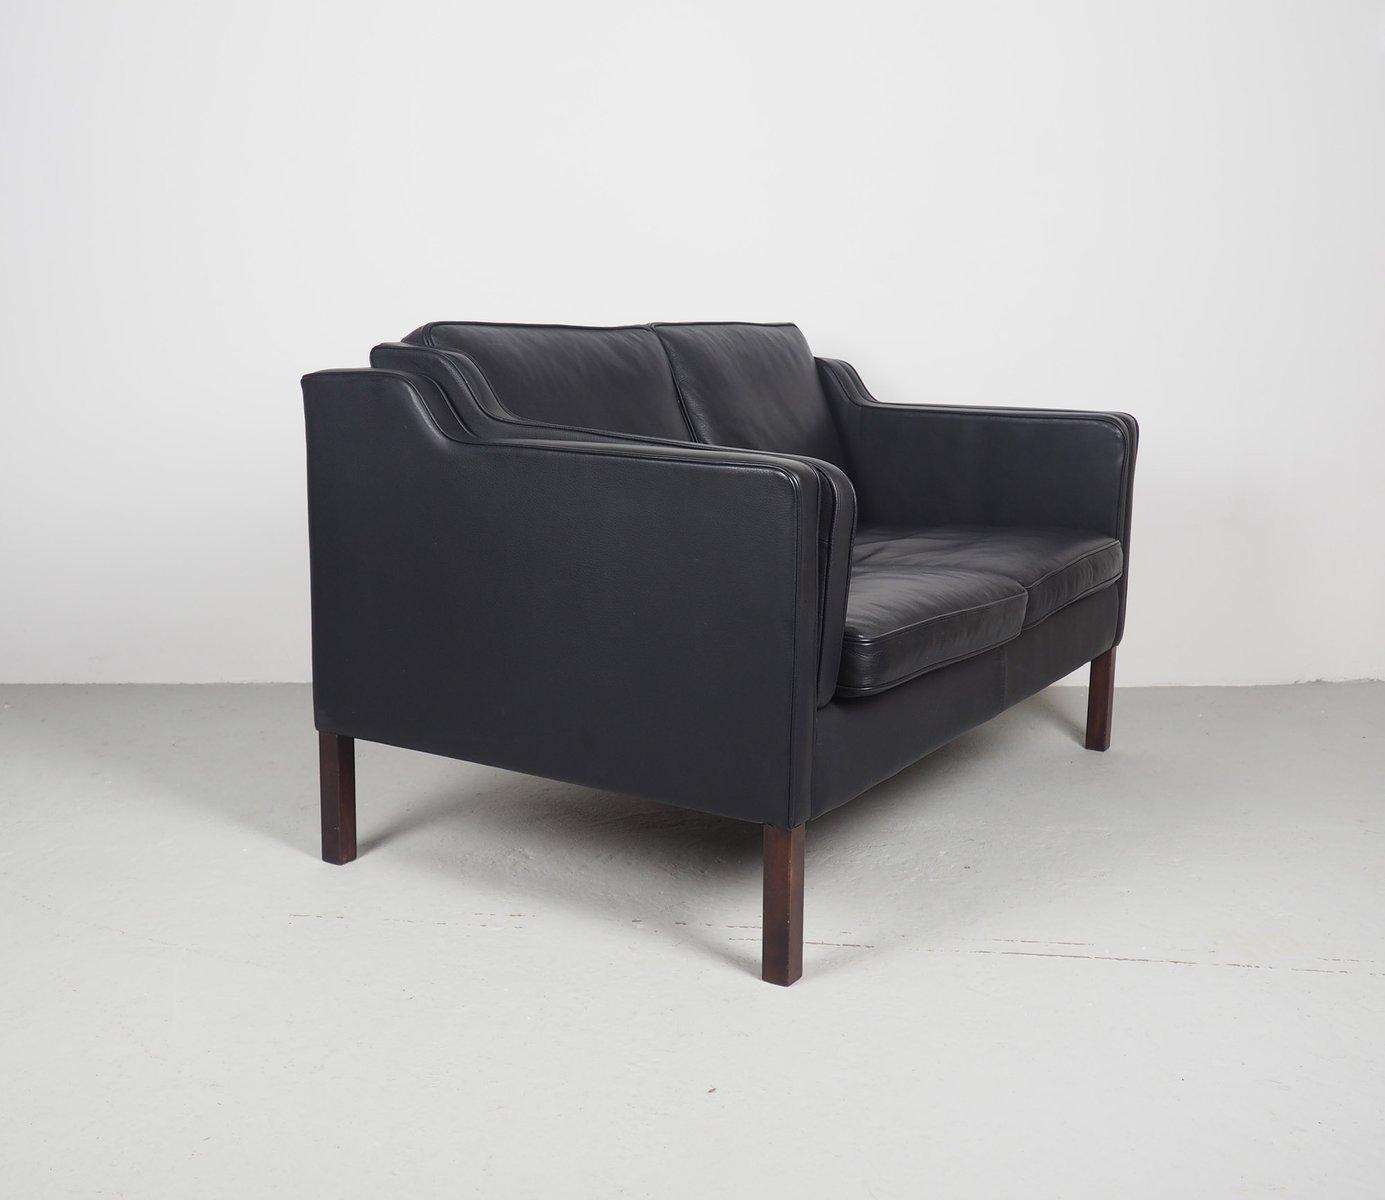 Schwarzes Vintage Modell Eva 2-Sitzer Ledersofa von Stouby bei Pamono kaufen